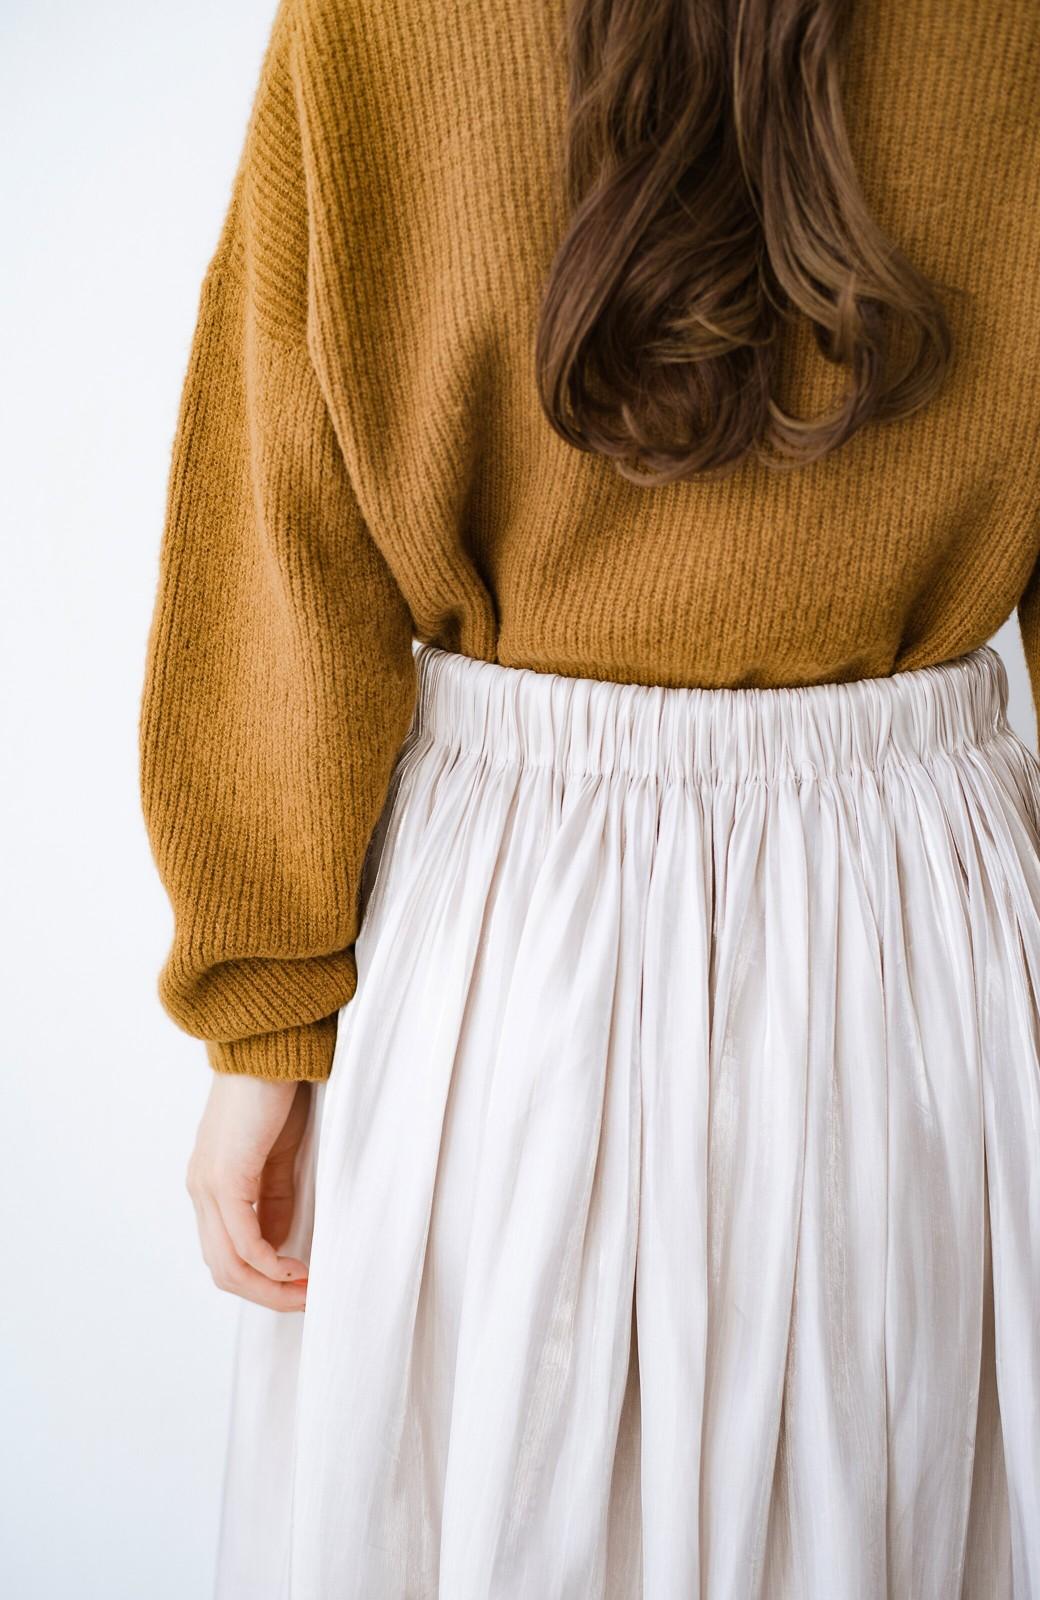 haco! 【人気のため新色追加!】1枚でも重ね着にも便利なキラキラ素材がかわいいロングスカート by laulea <アイボリー>の商品写真8